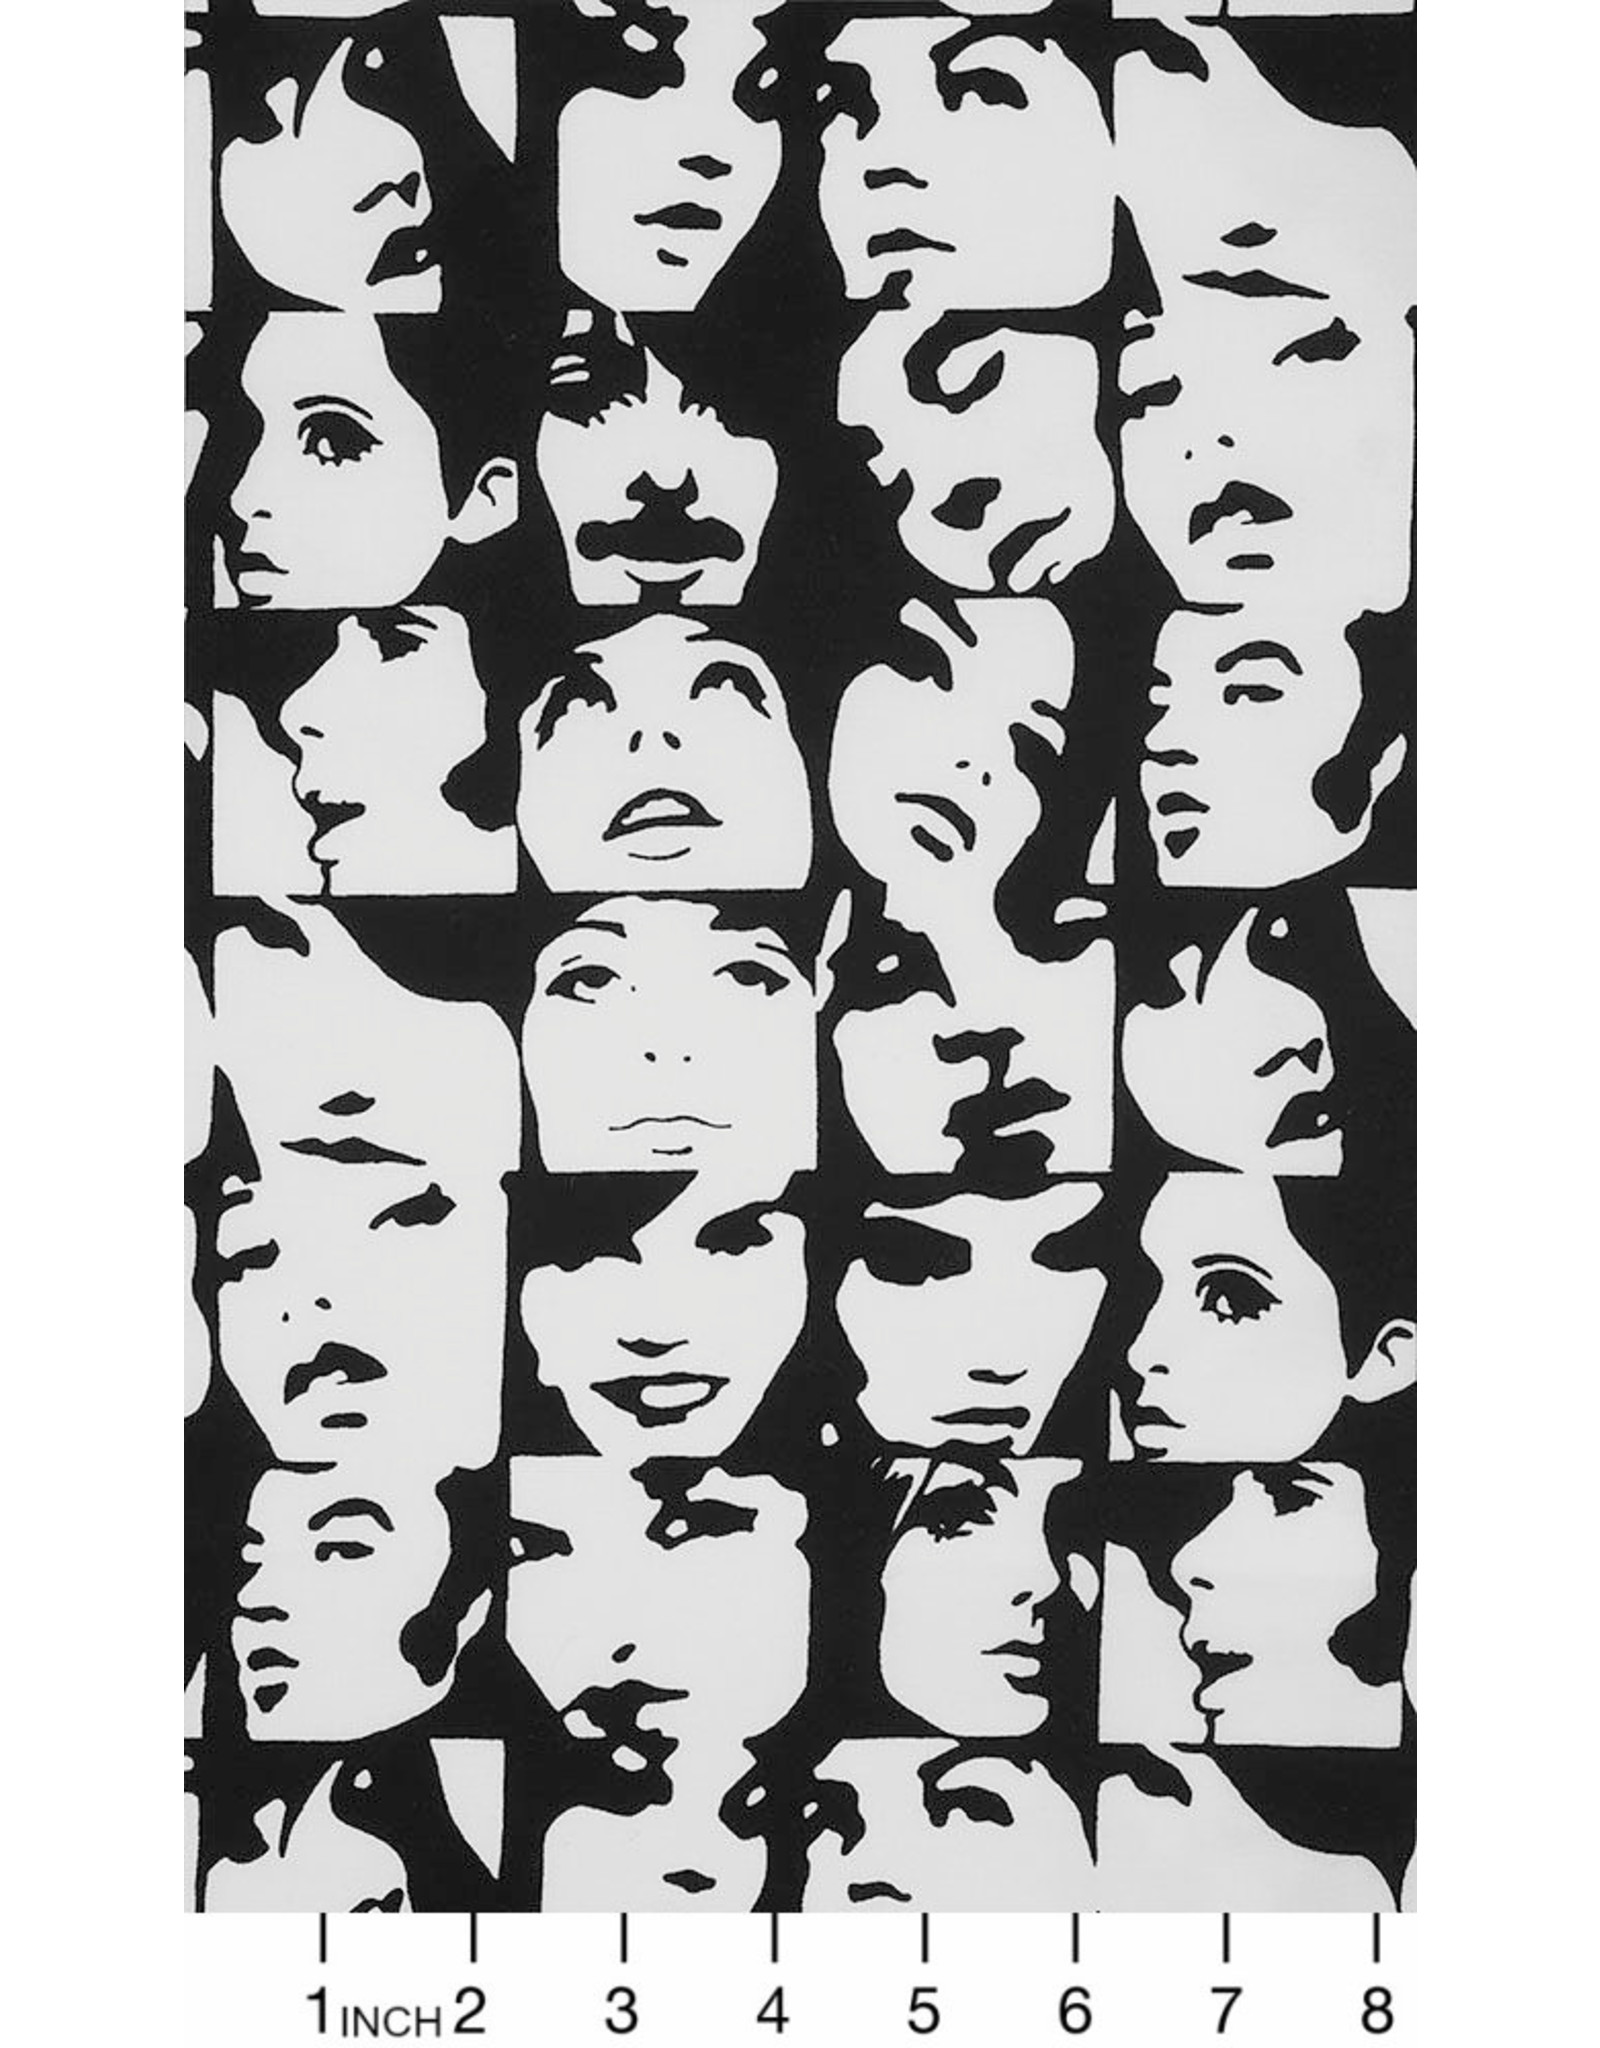 Alexander Henry Fabrics Nicole's Prints, In Crowd in B+W, Fabric Half-Yards